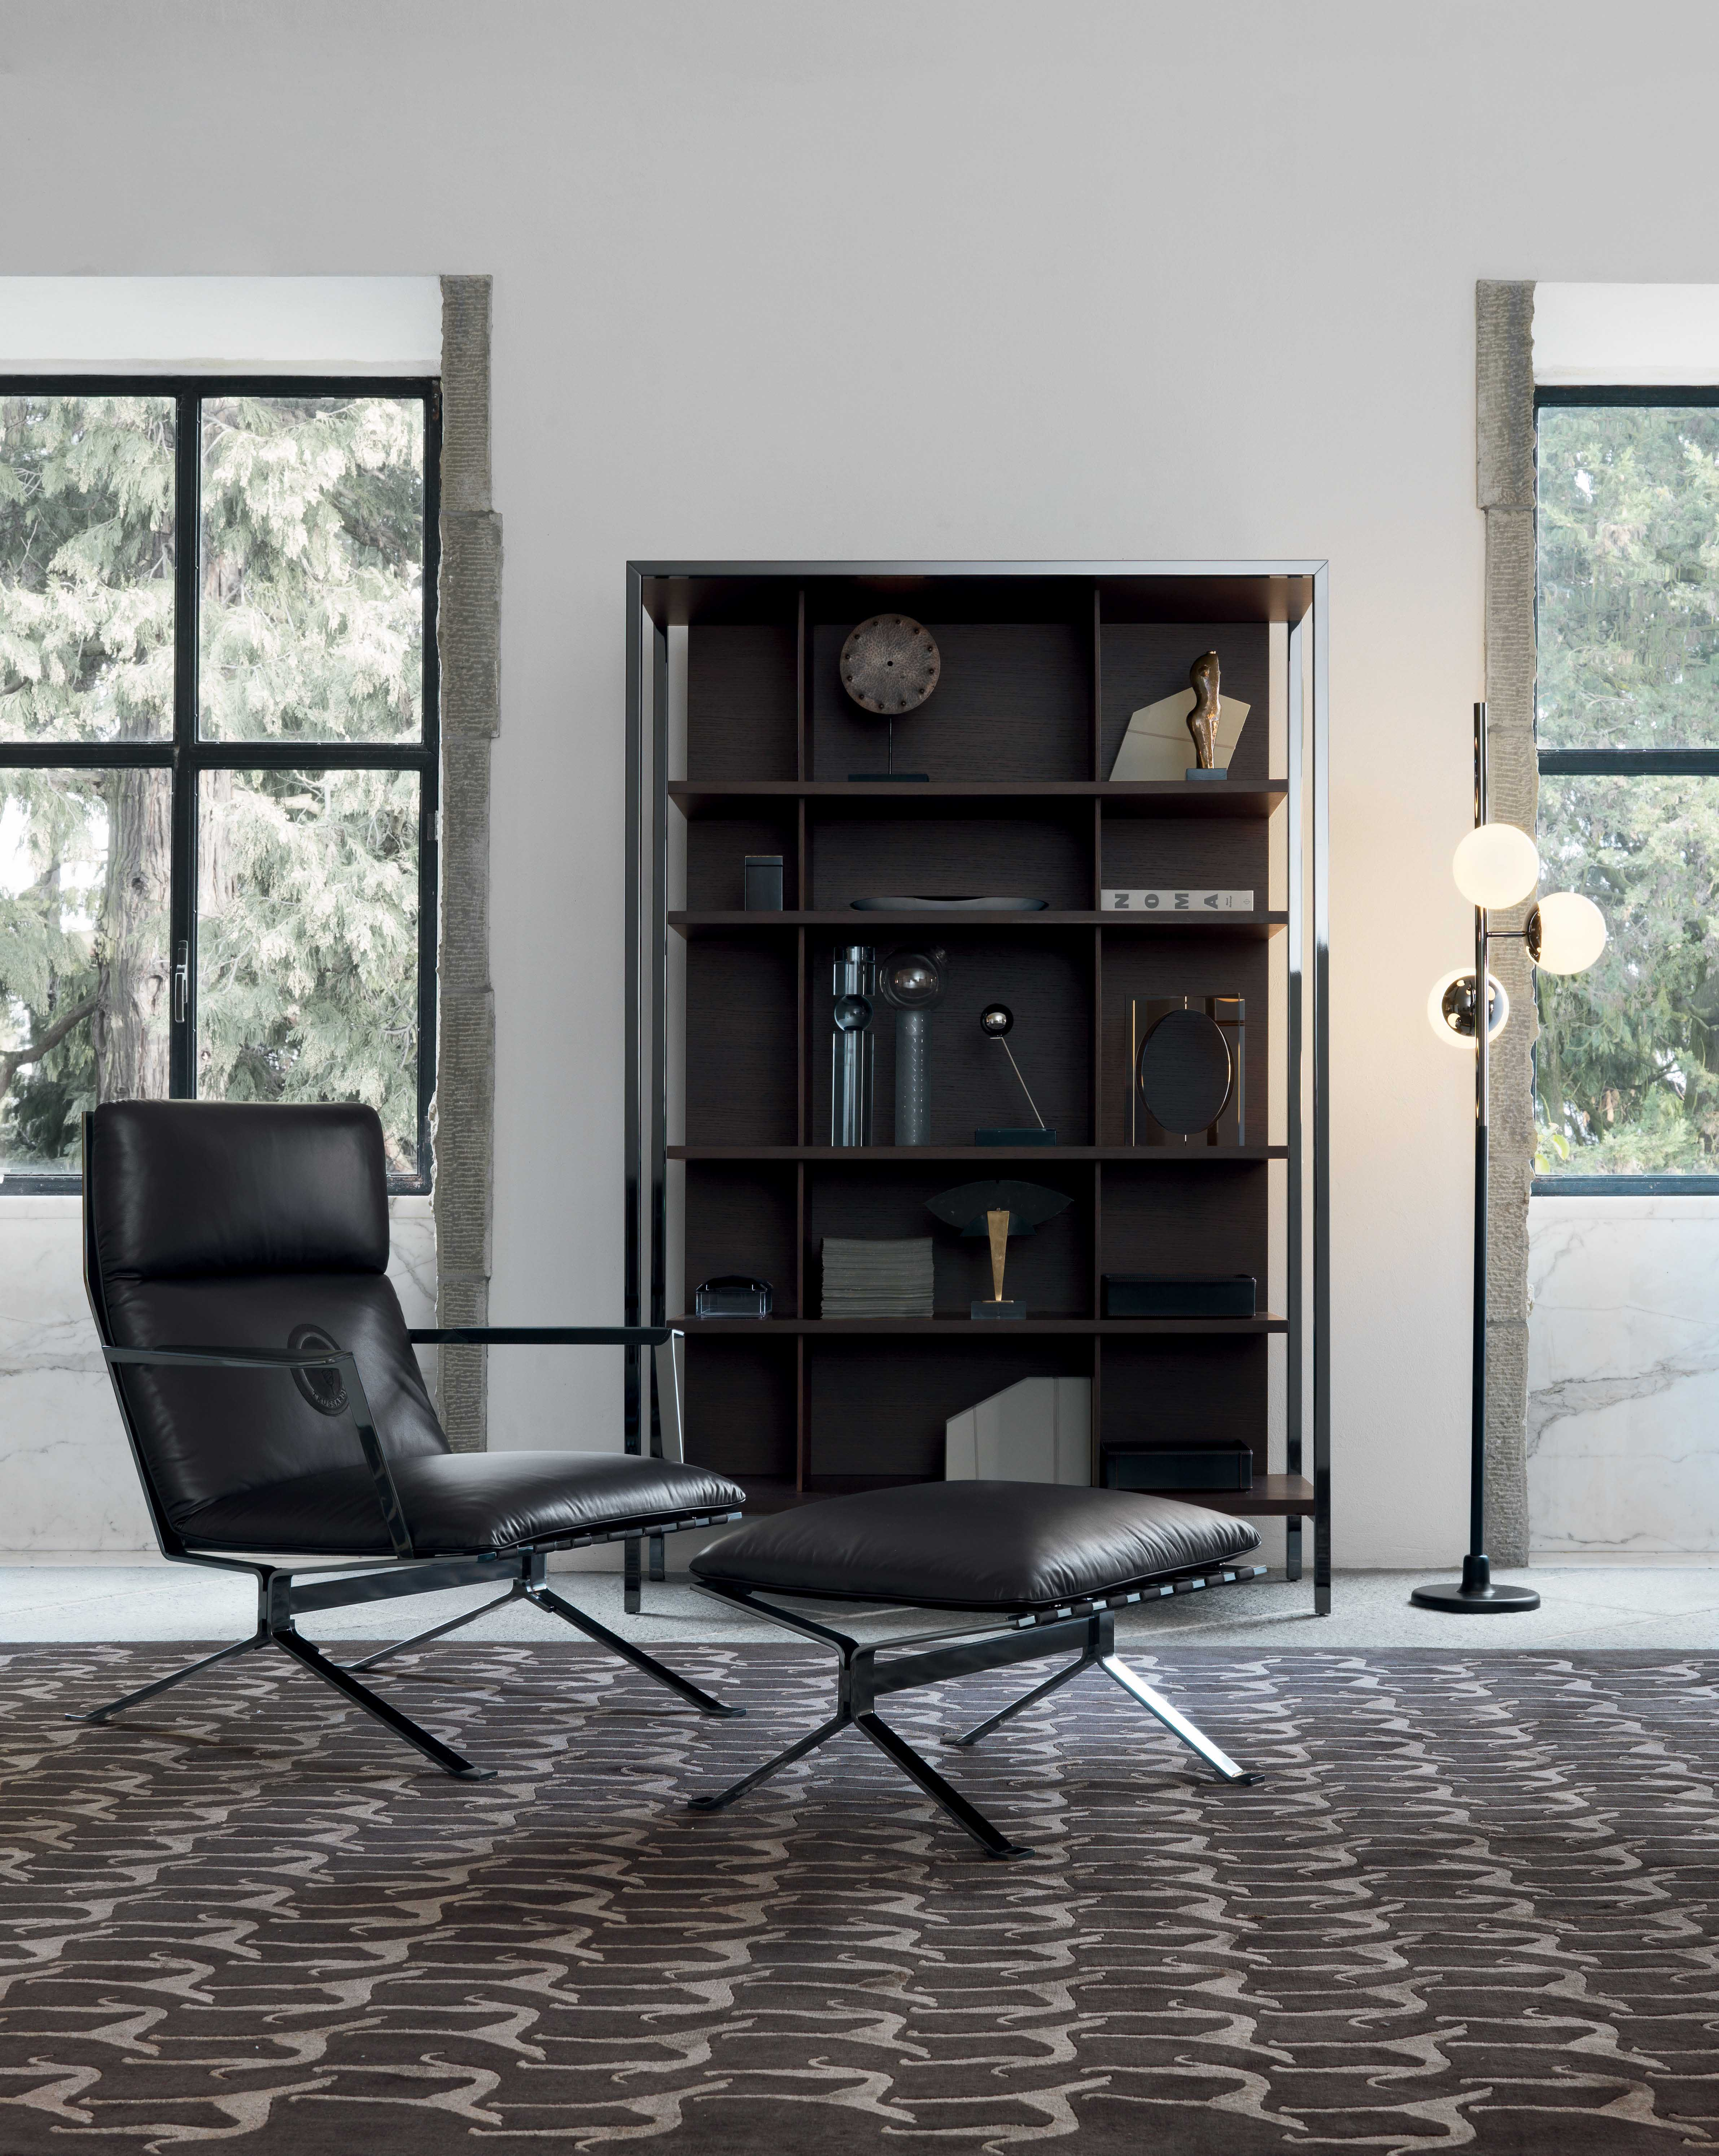 tr_sit_414_armchairs__footstool_bridge_bookshelf__greyhound_rug